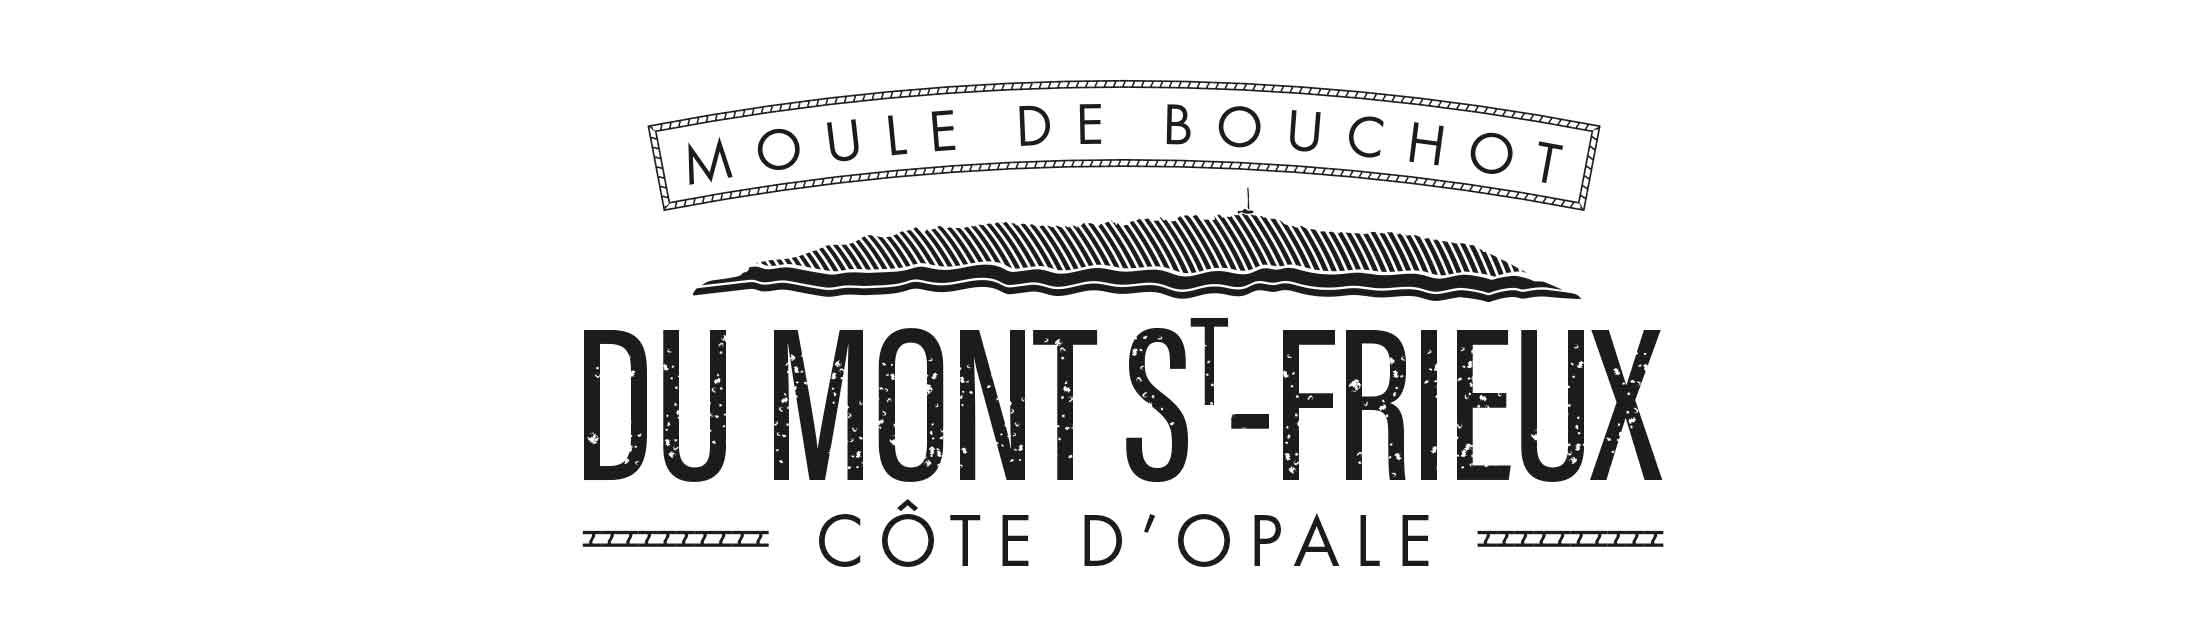 logo-moules-bouchot-2